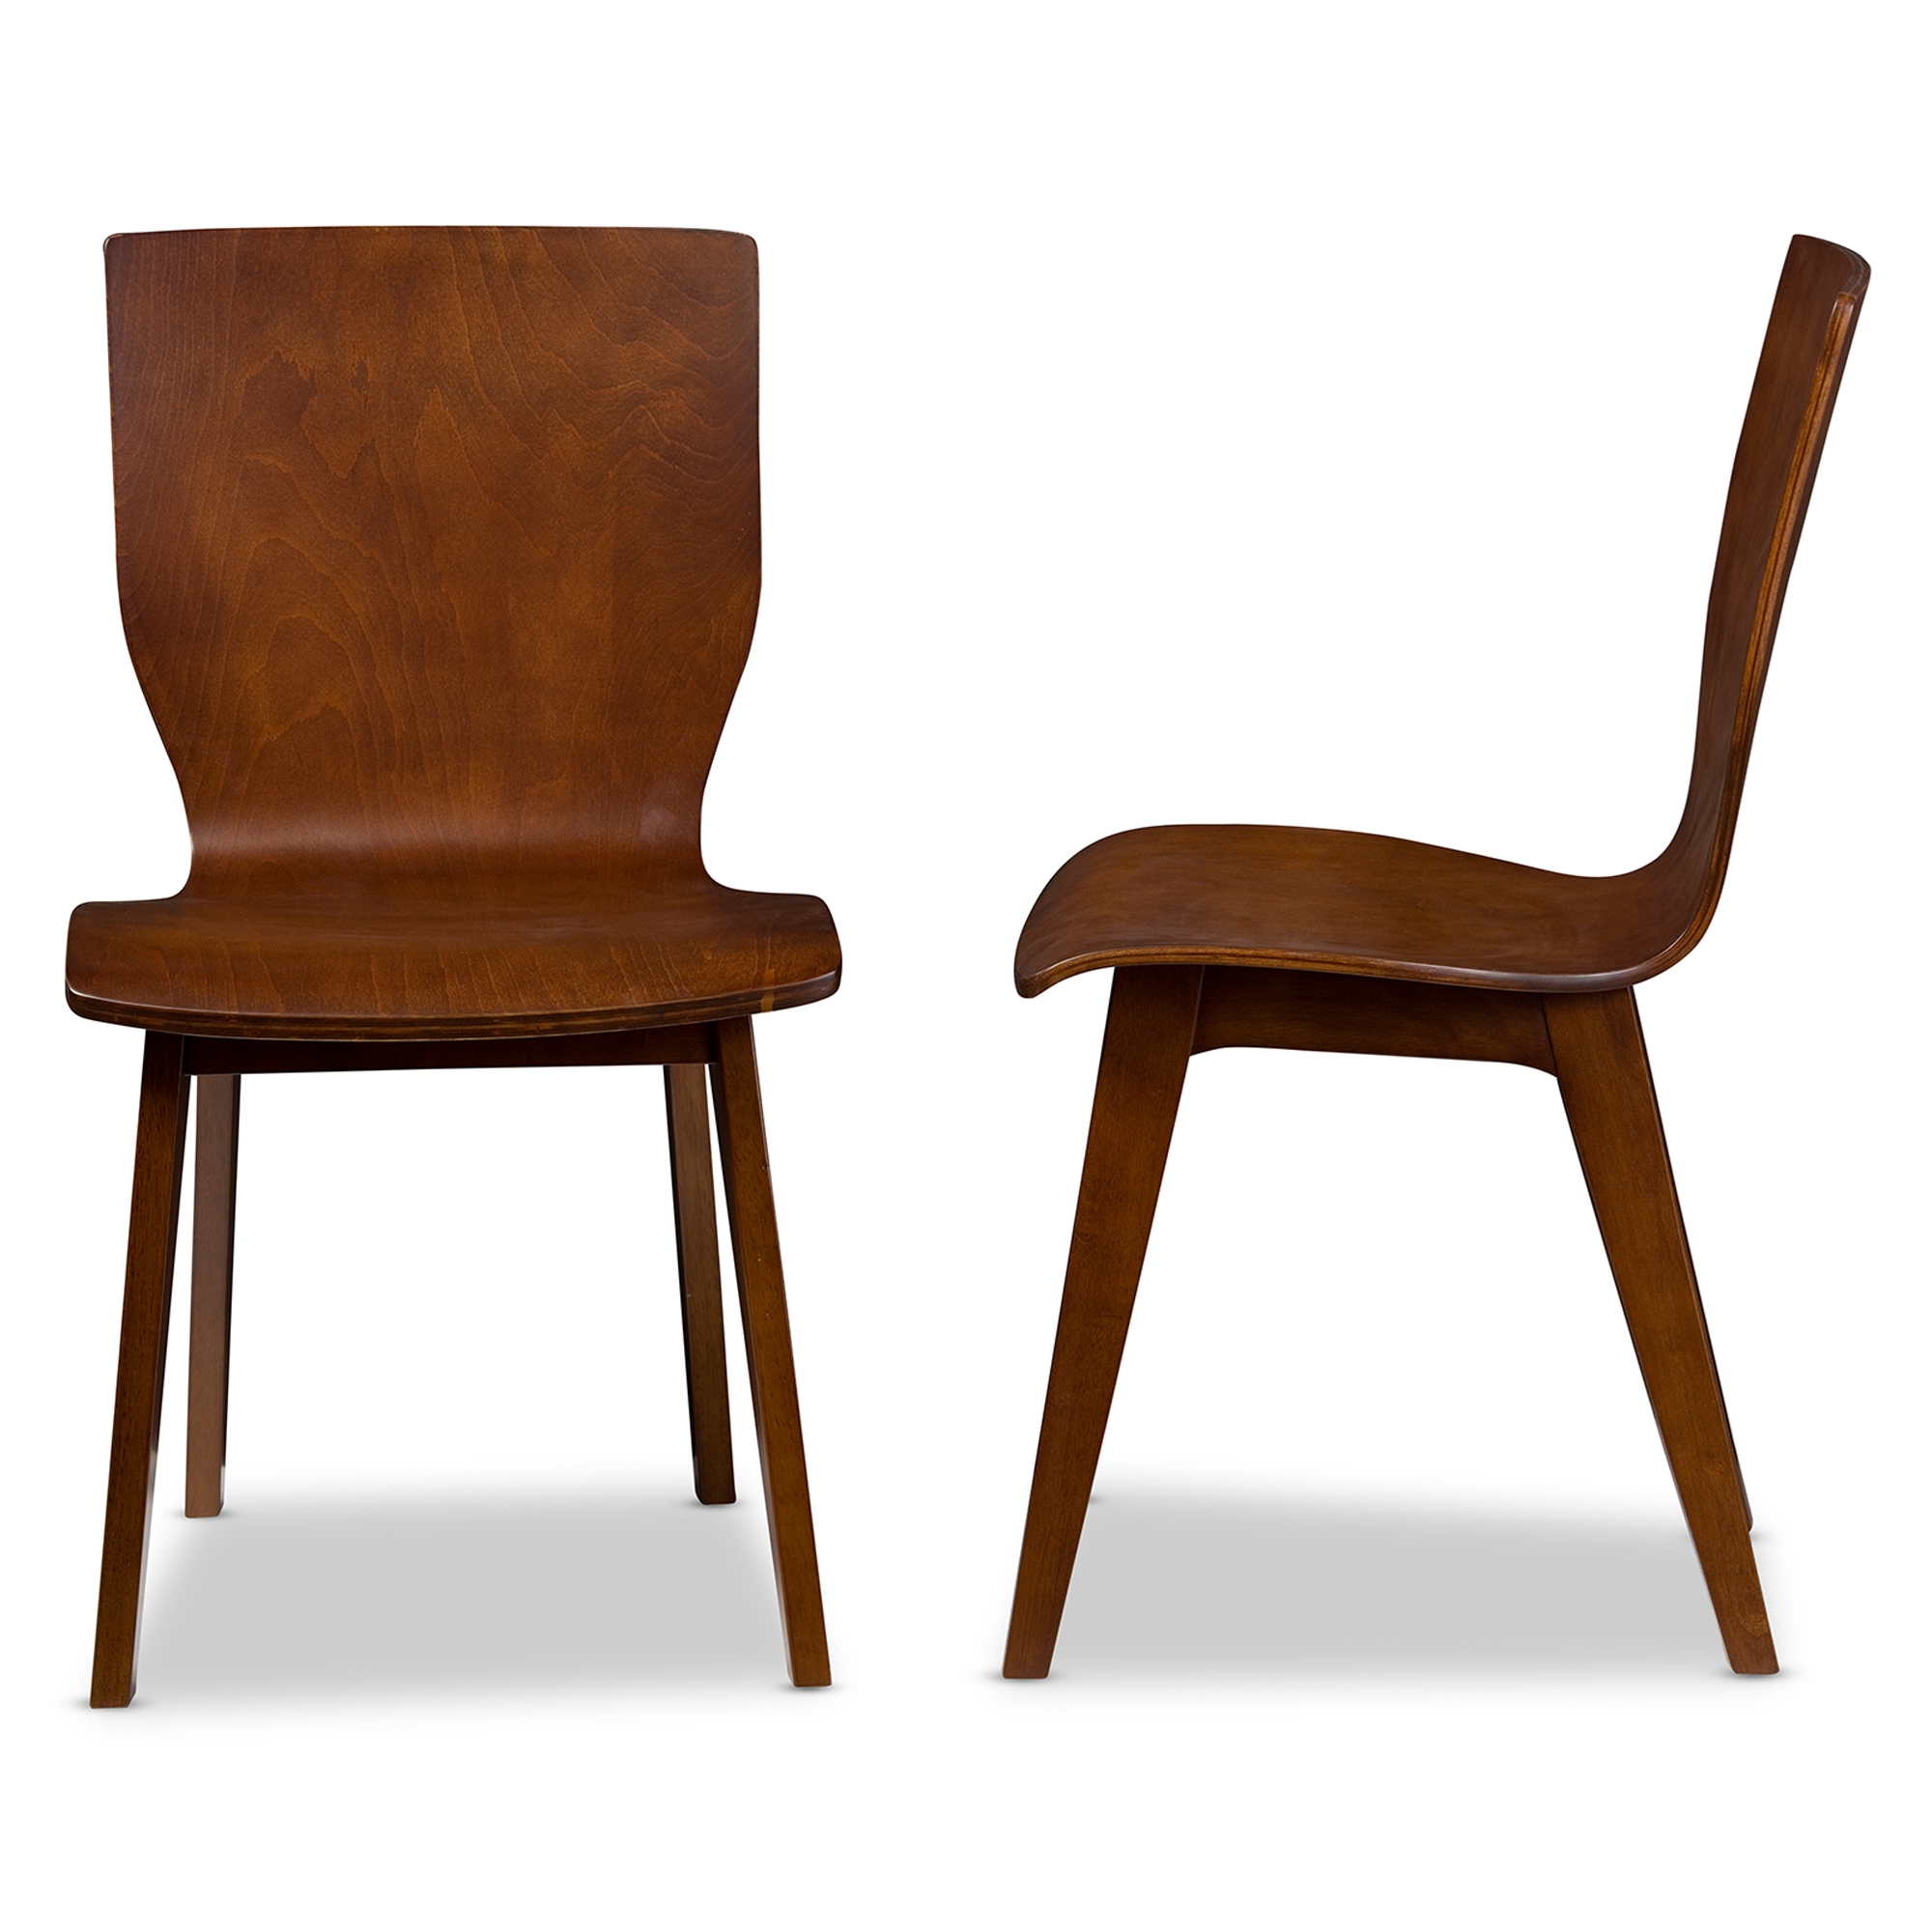 Incroyable Baxton Studio Elsa Mid Century Modern Scandinavian Style Dark Walnut Bent  Wood Dining Chair ...